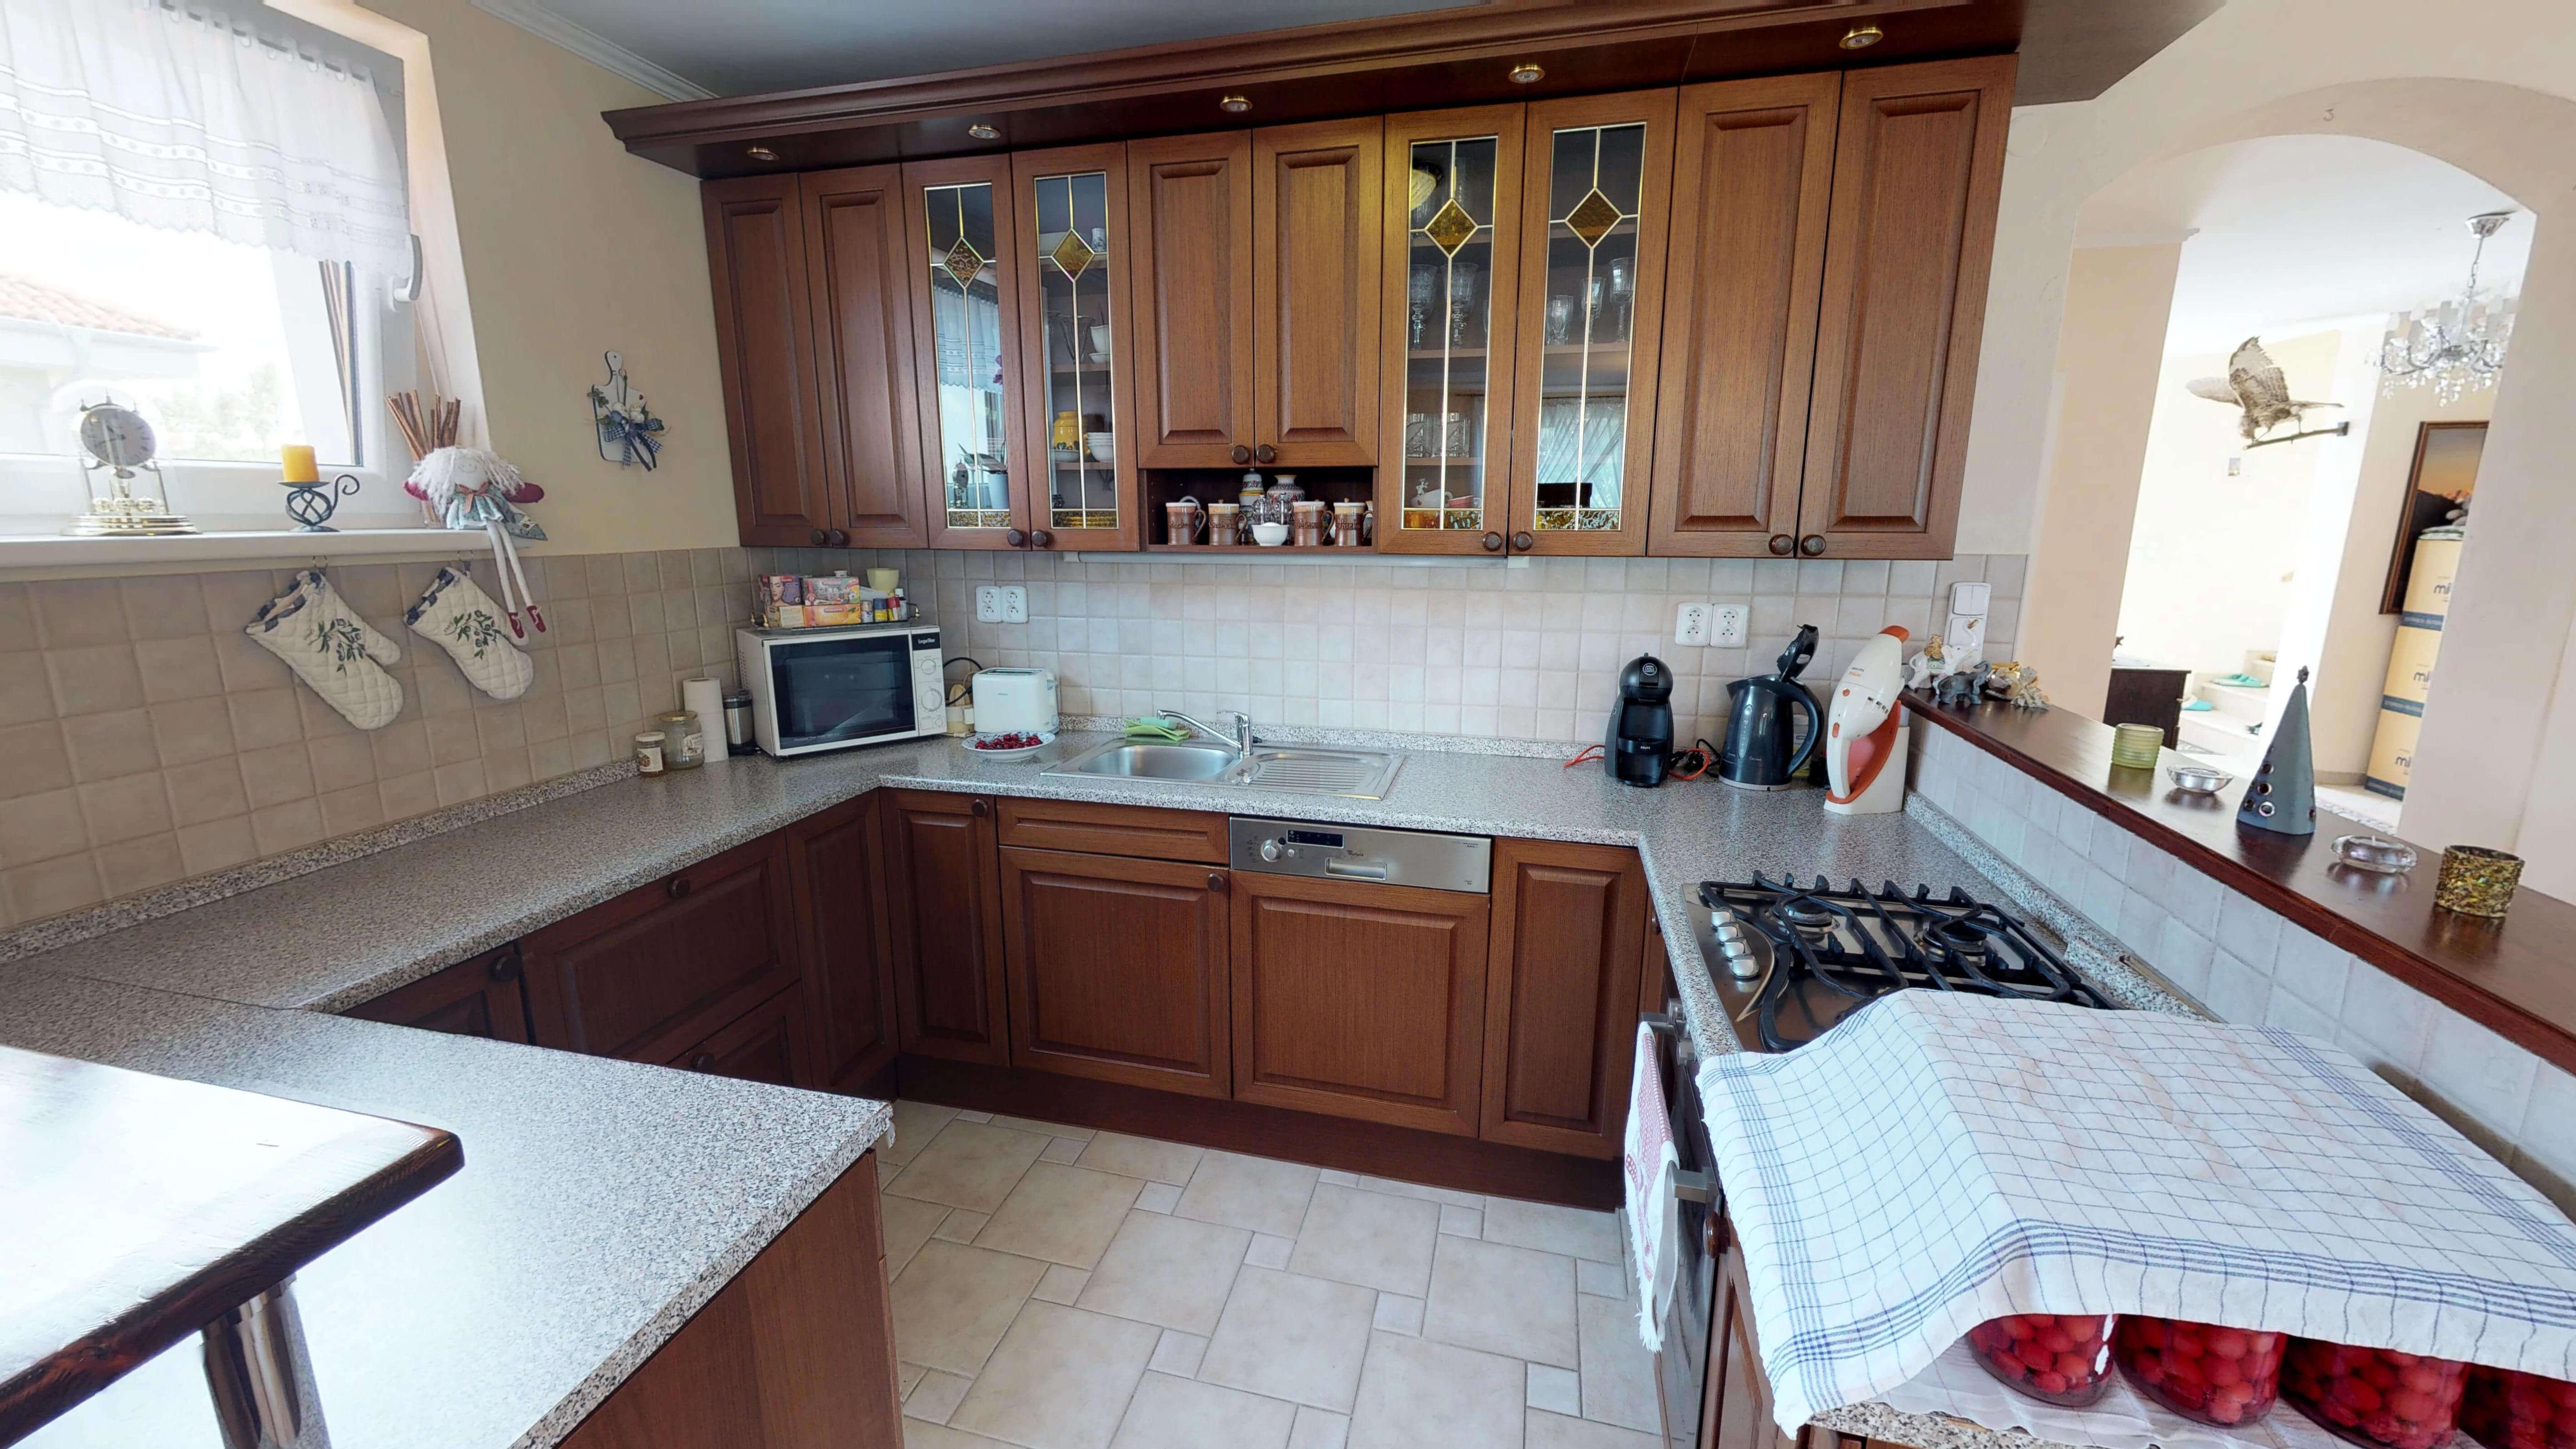 Rodinný dom na uzavretej ulici, Vojtechovce, 2 – generačný 6 izbový, úžitková 270m2, pozemok 600m2, garáž-3